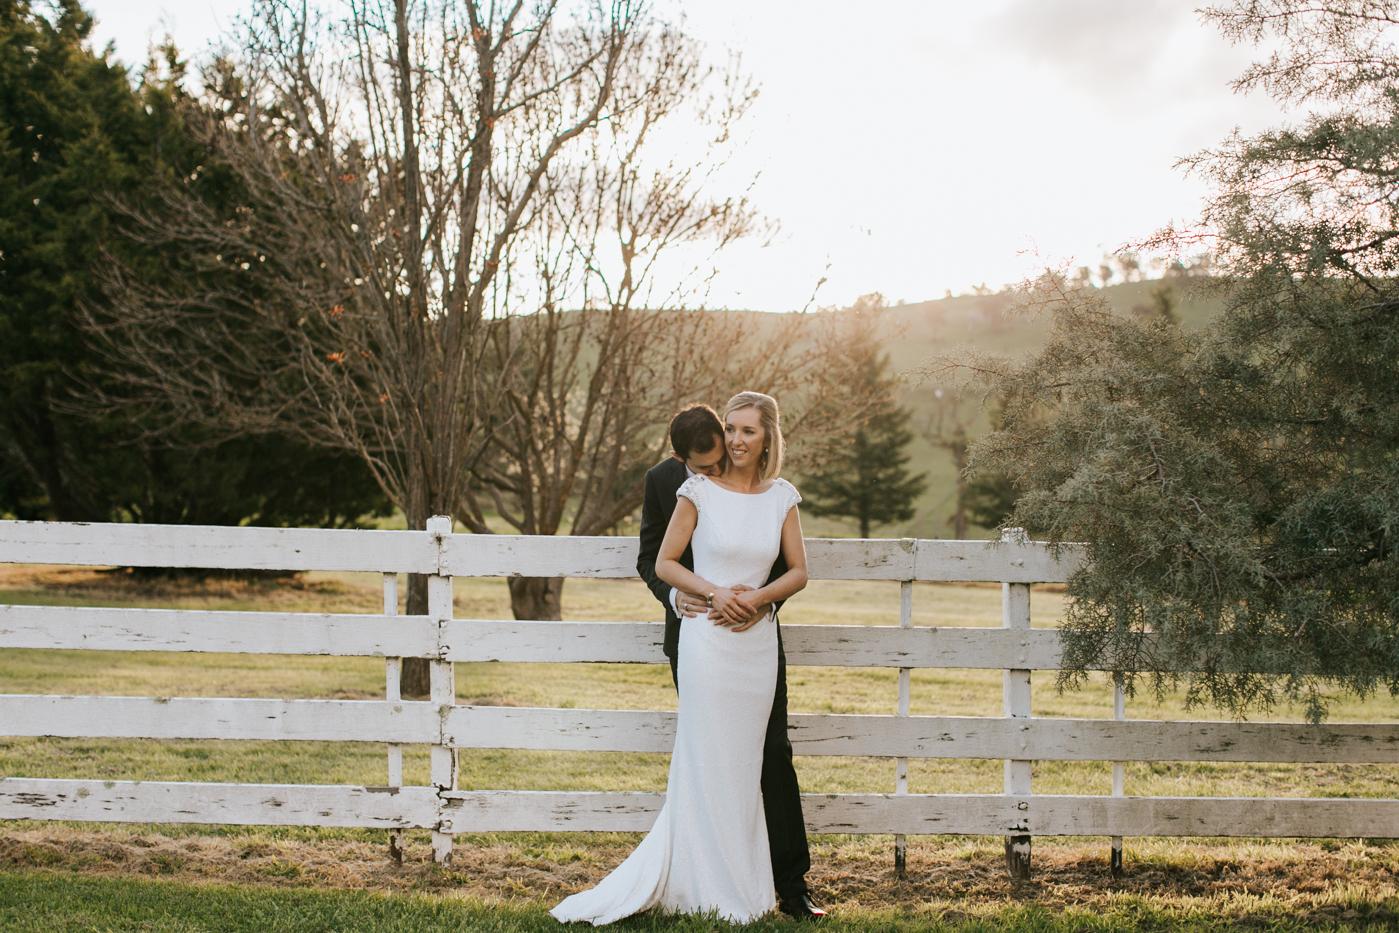 Bridget & James - Orange Country Wedding - Samantha Heather Photography-170.jpg